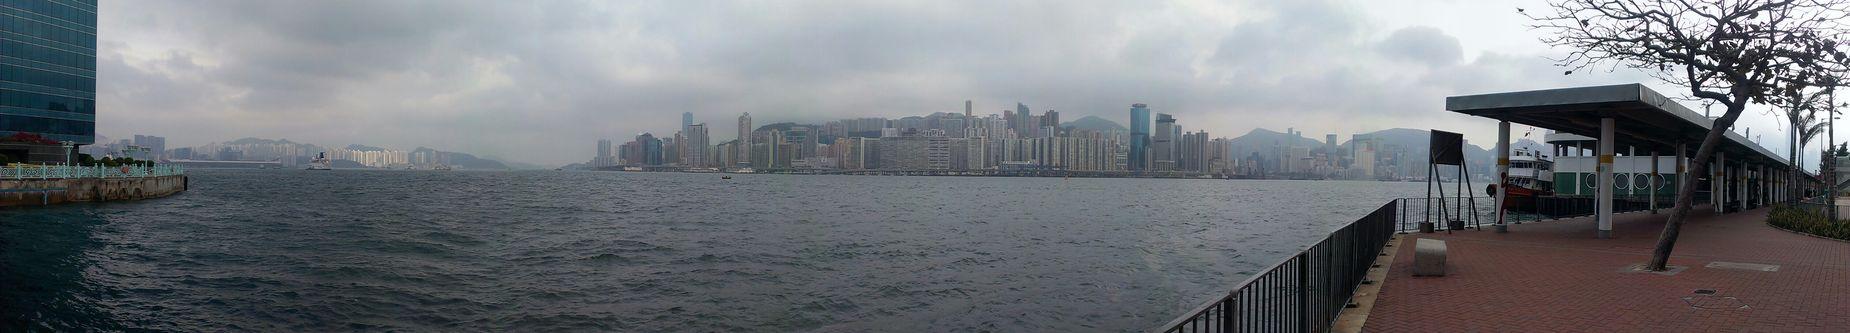 Victoria Harbour Panorama Hong Kong Noedit Enjoying The Sights